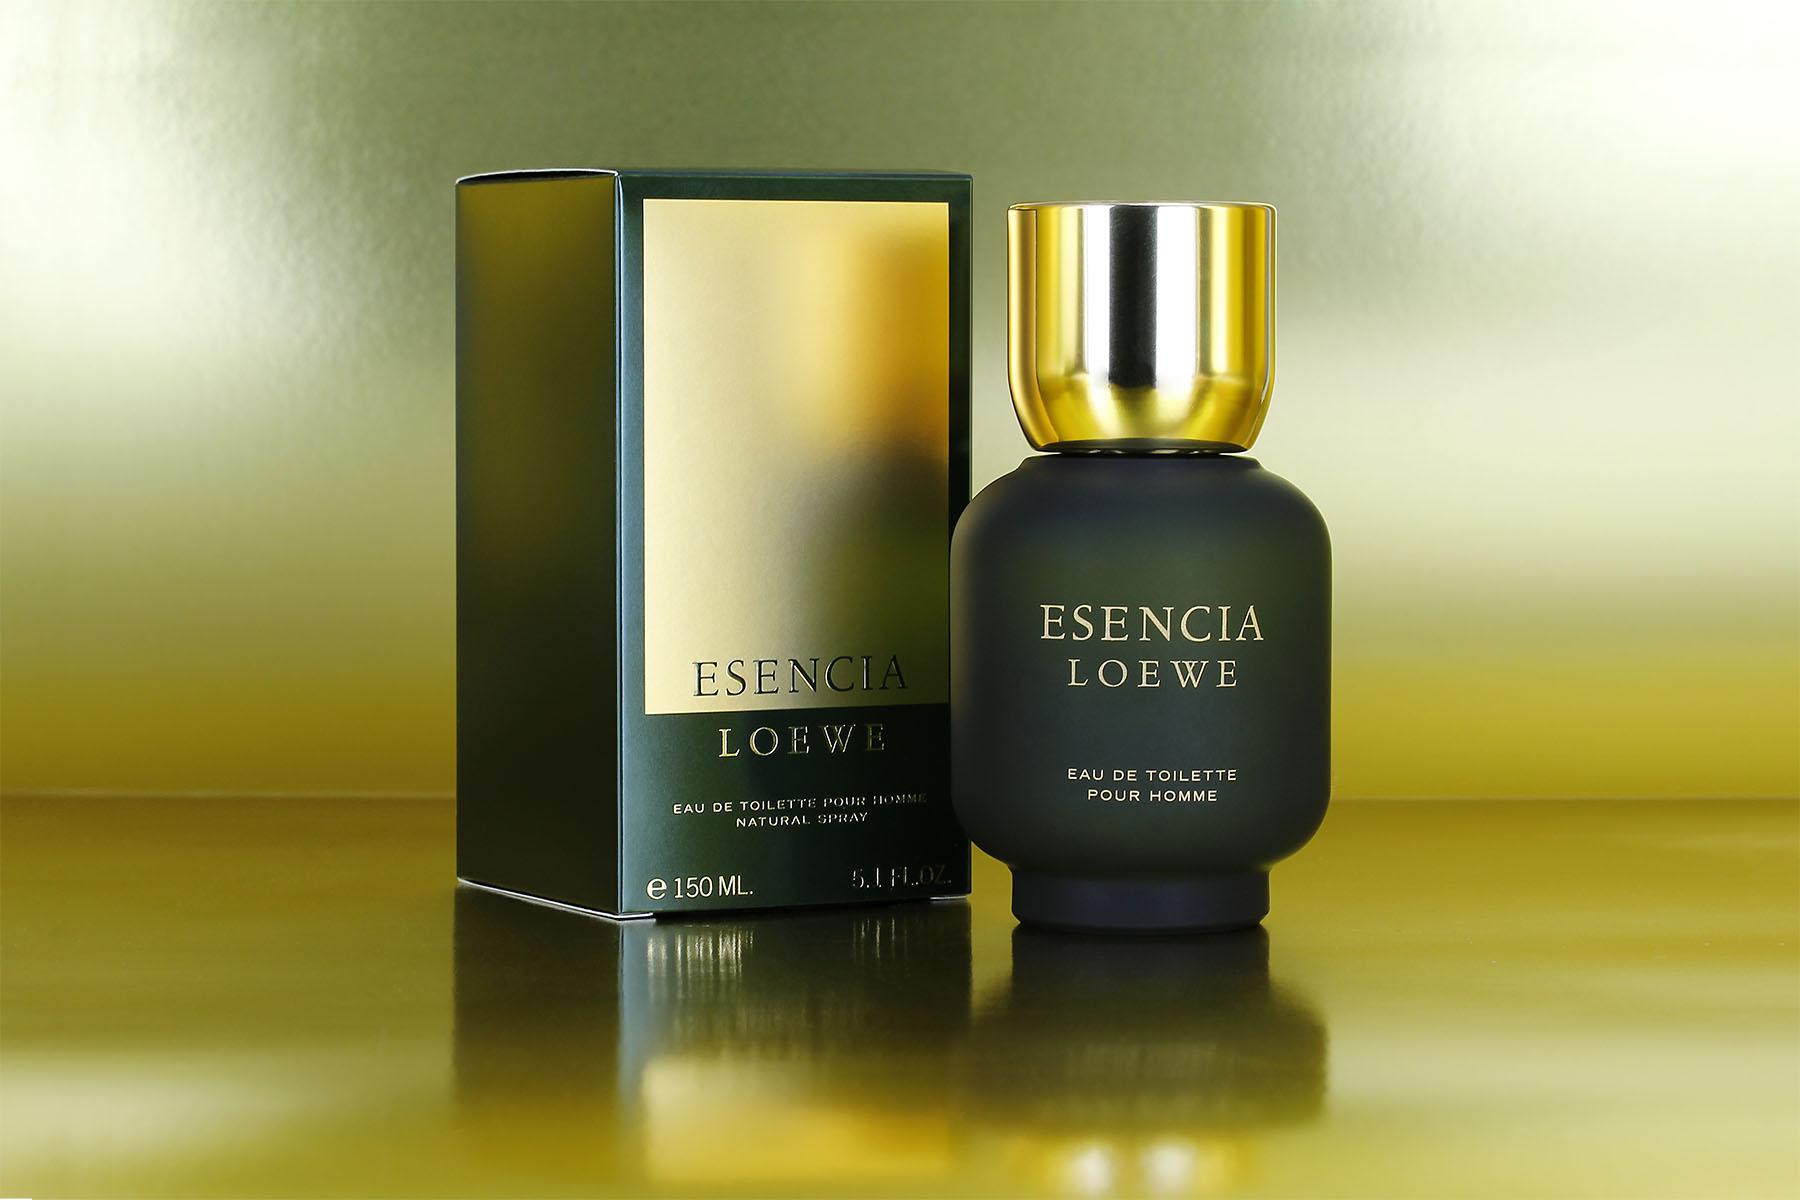 Esencia de Loewe